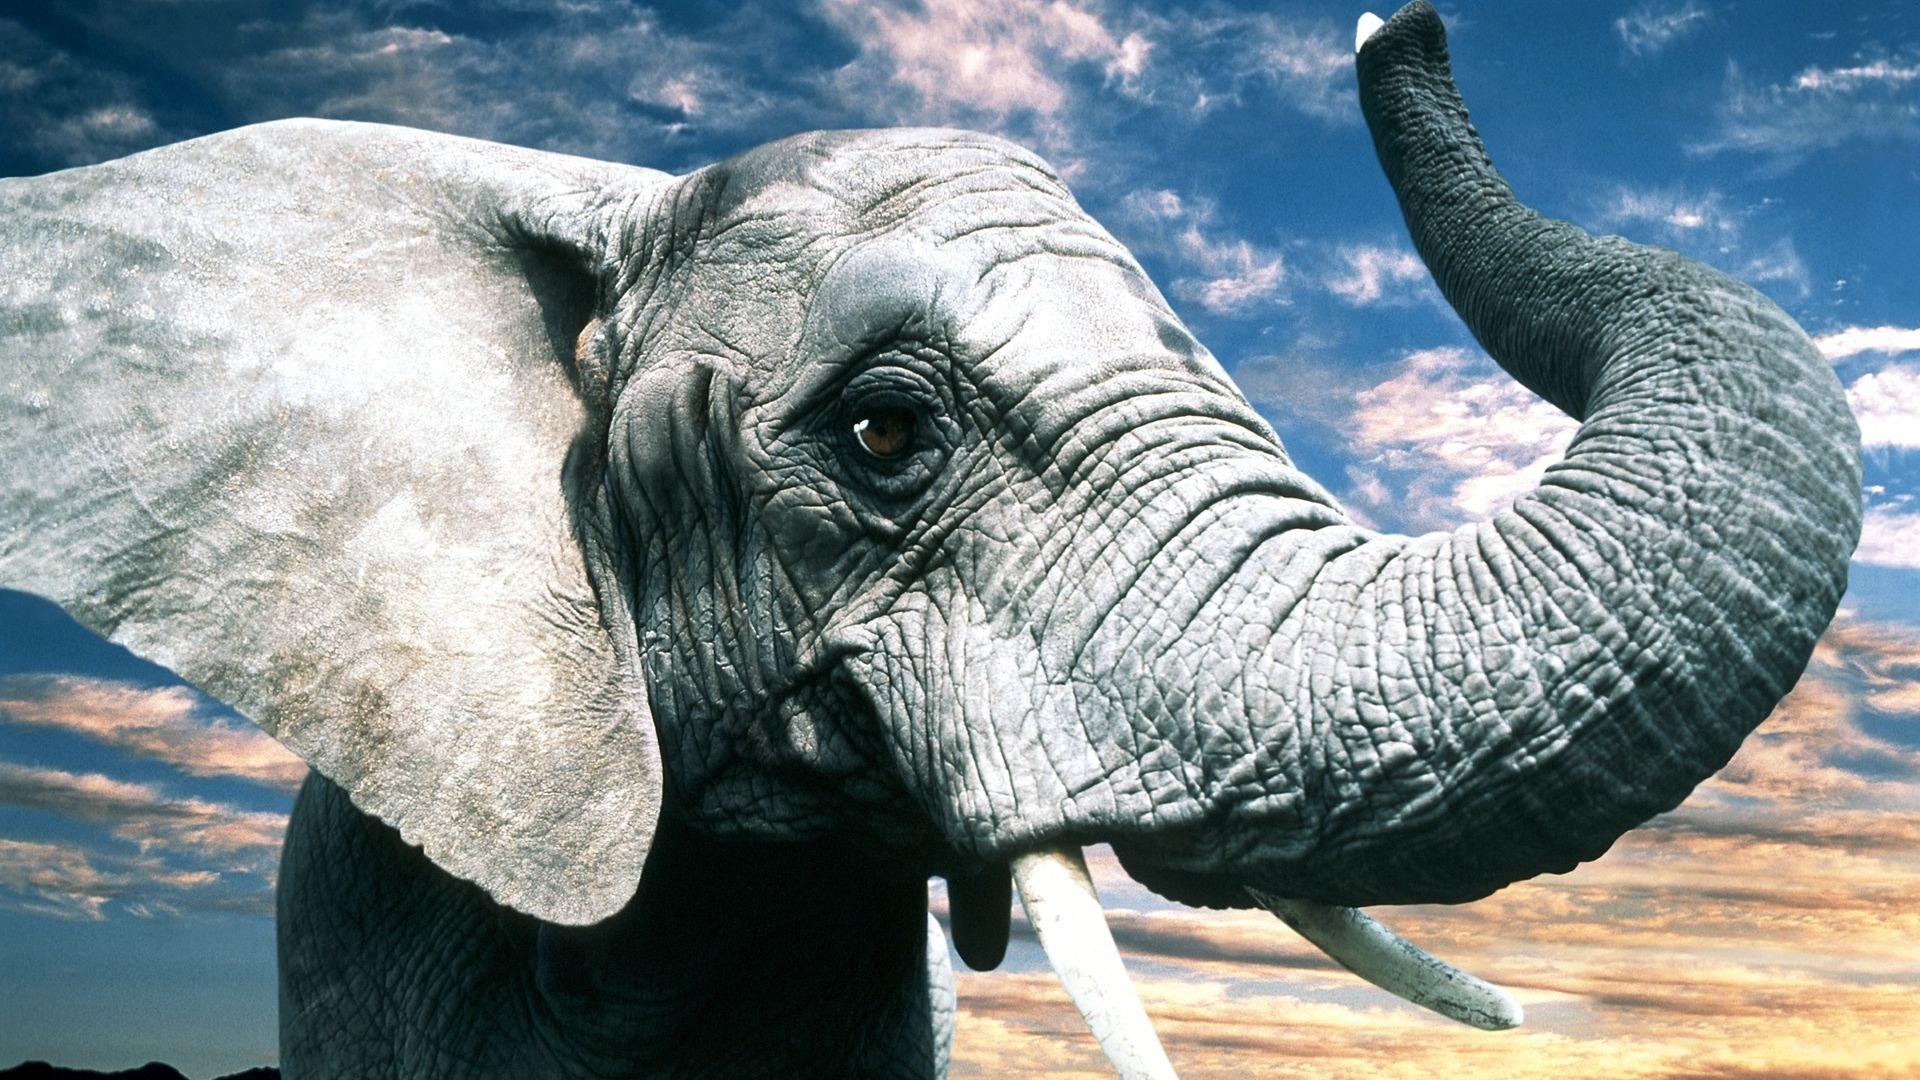 Hd wallpaper elephant - Elephant Hd Wallpaper 1080p Je11w0 Vefego Com